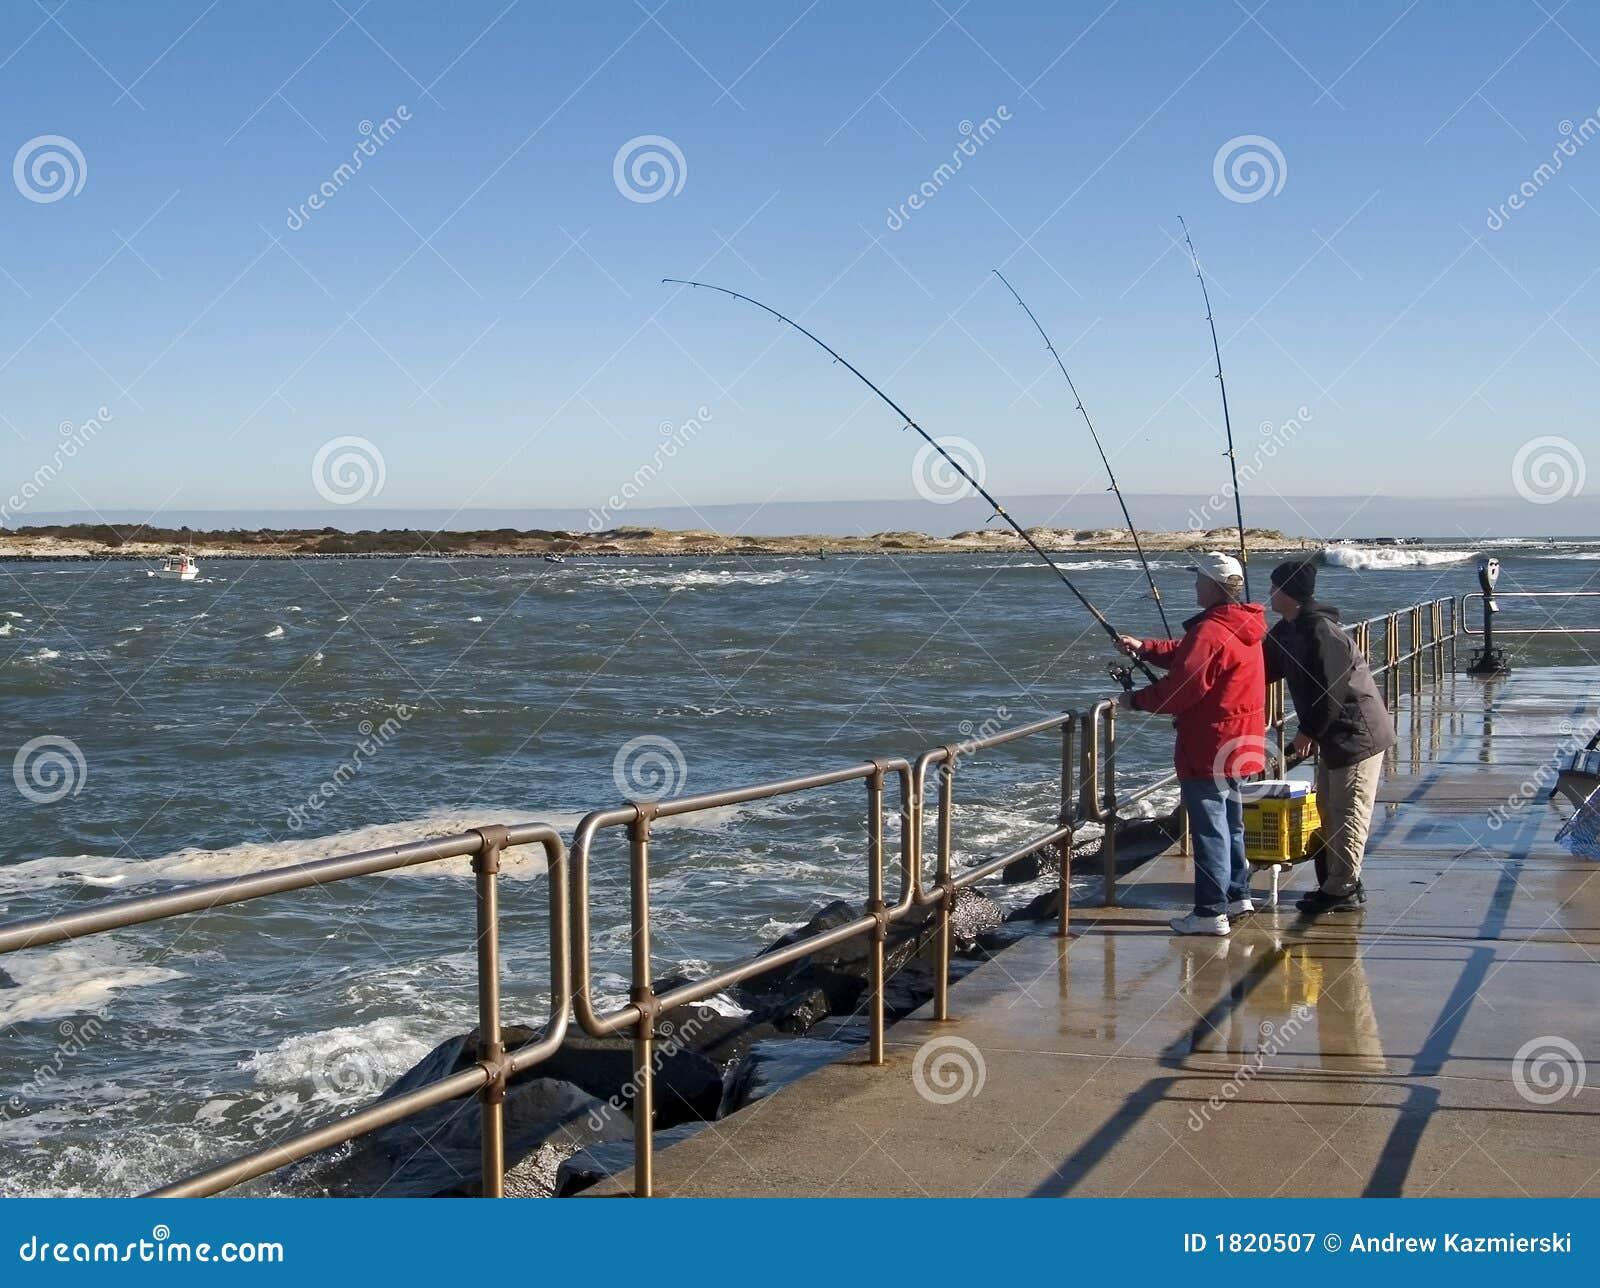 Pier fishing royalty free stock photography image 1820507 for Nj shore fishing